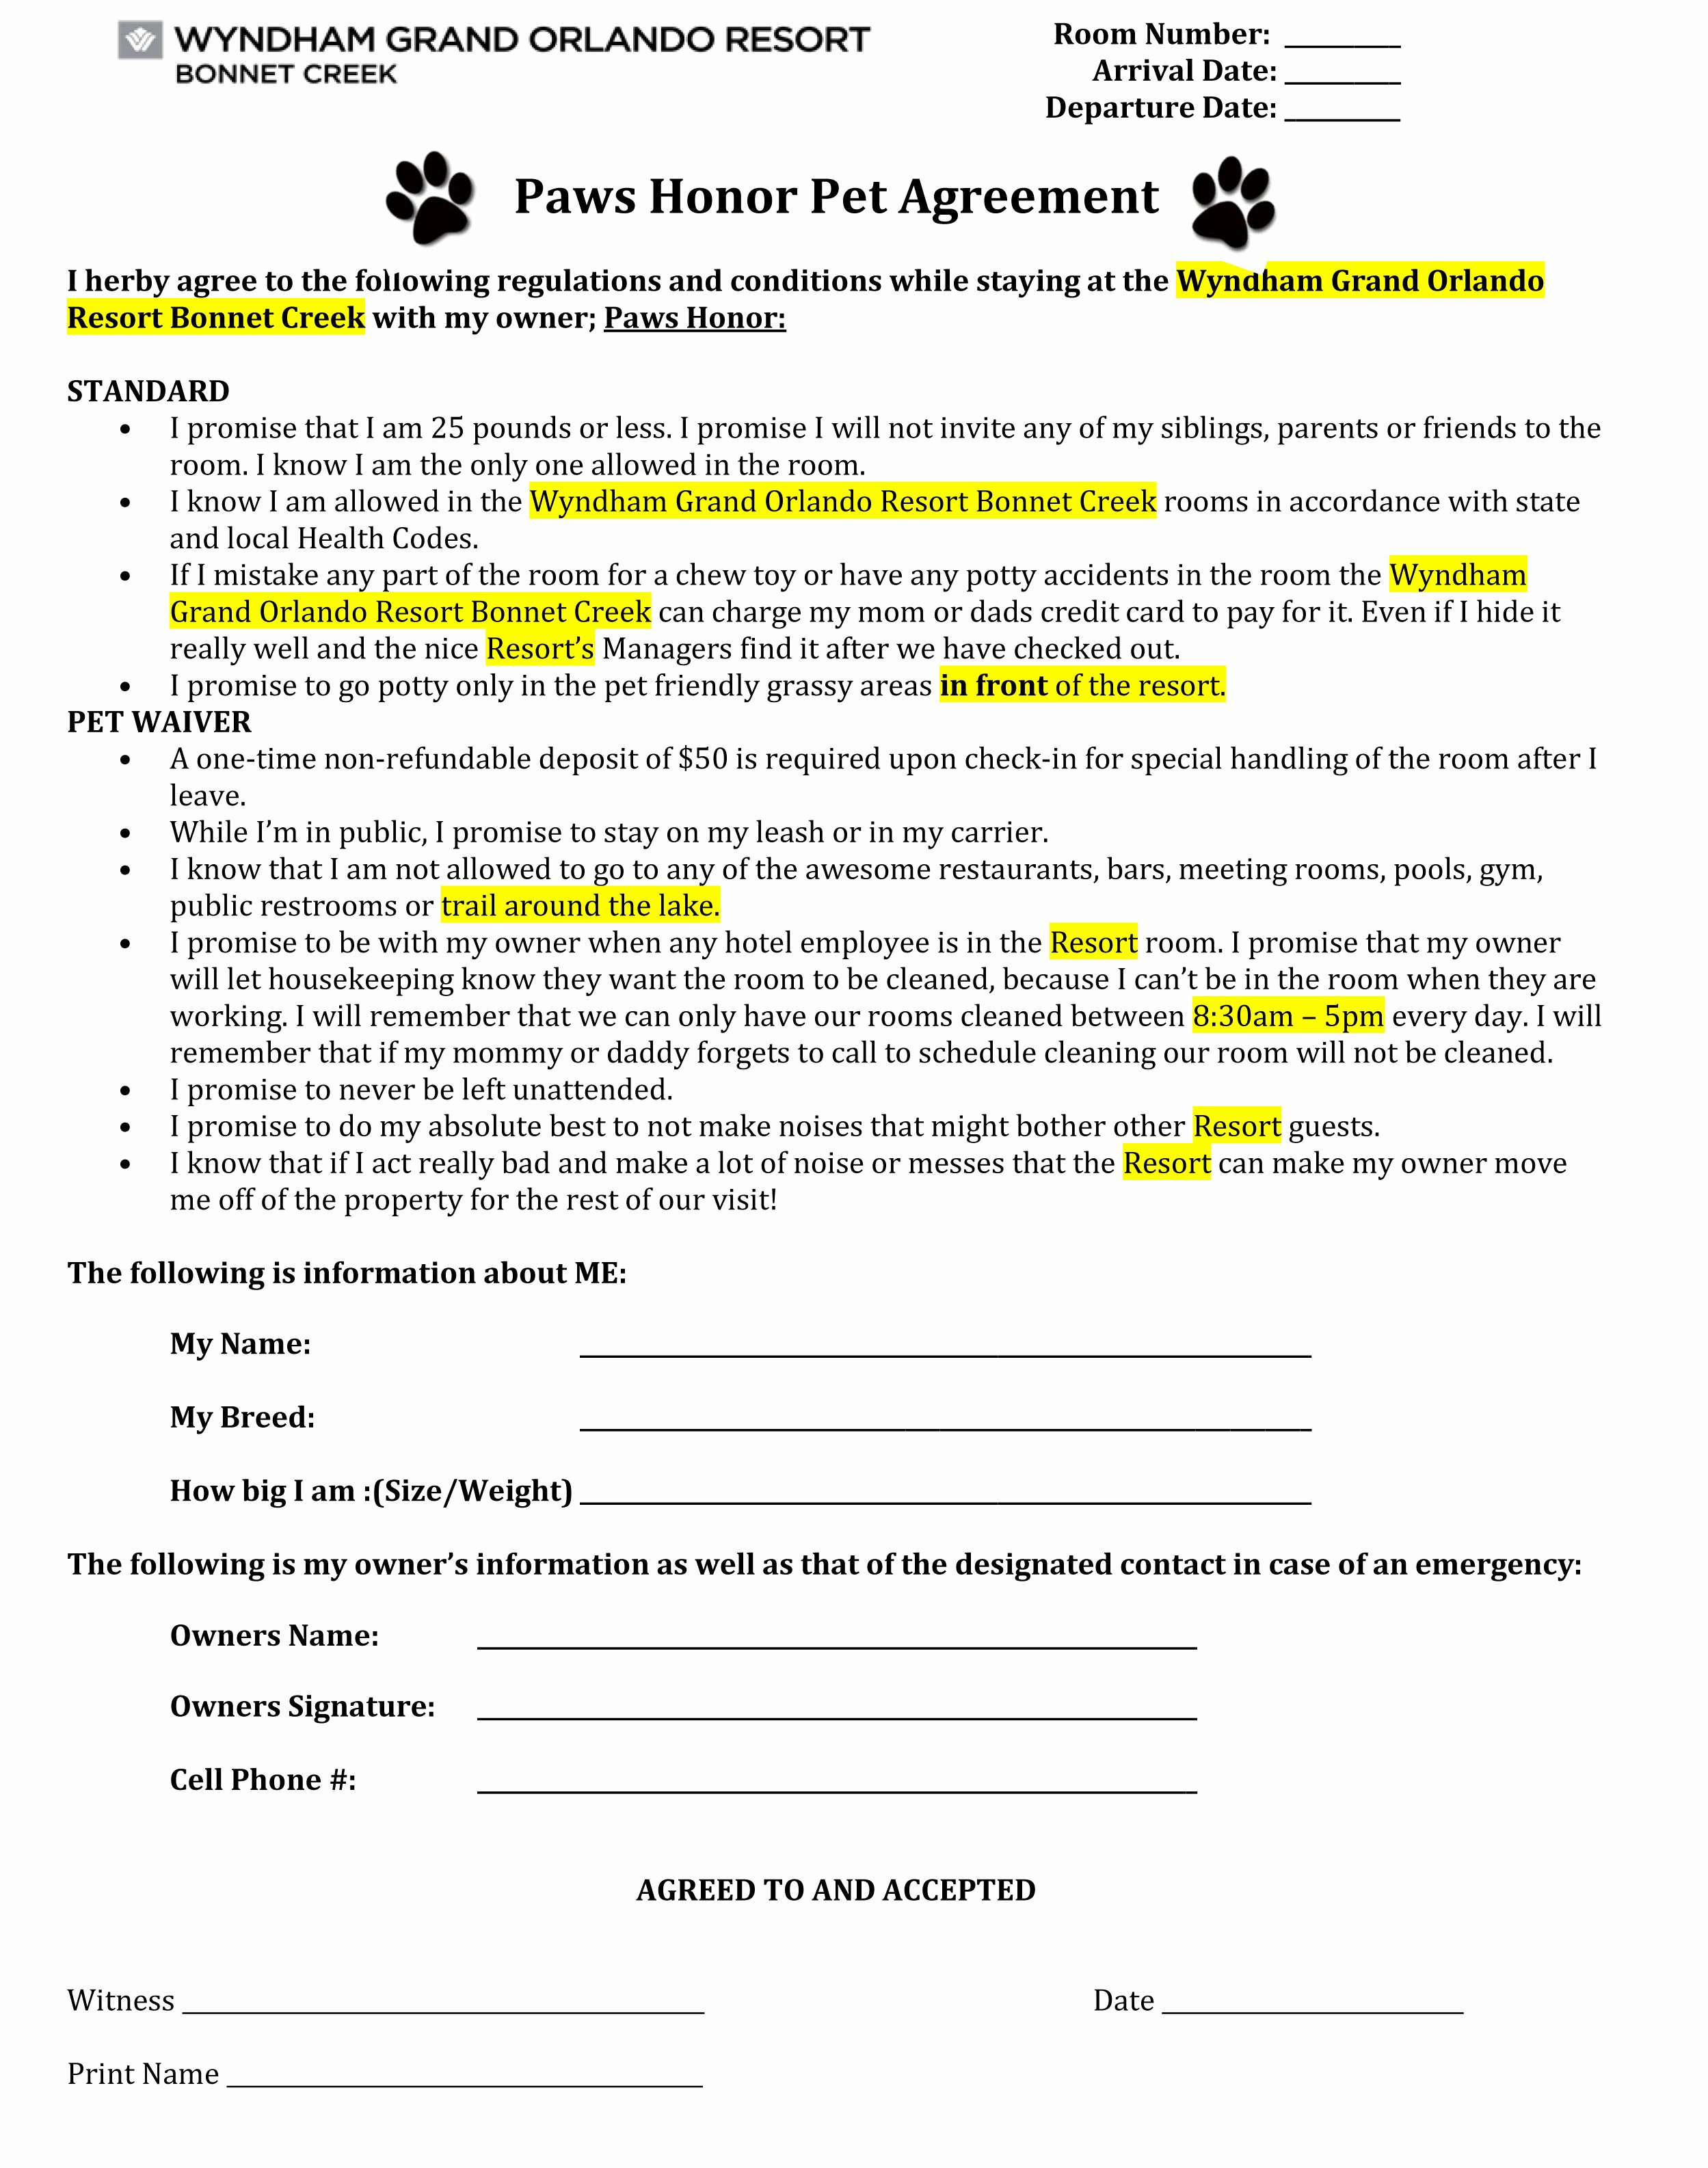 Gym Membership Agreement Template Fresh Planet Fitness Membership Agreement